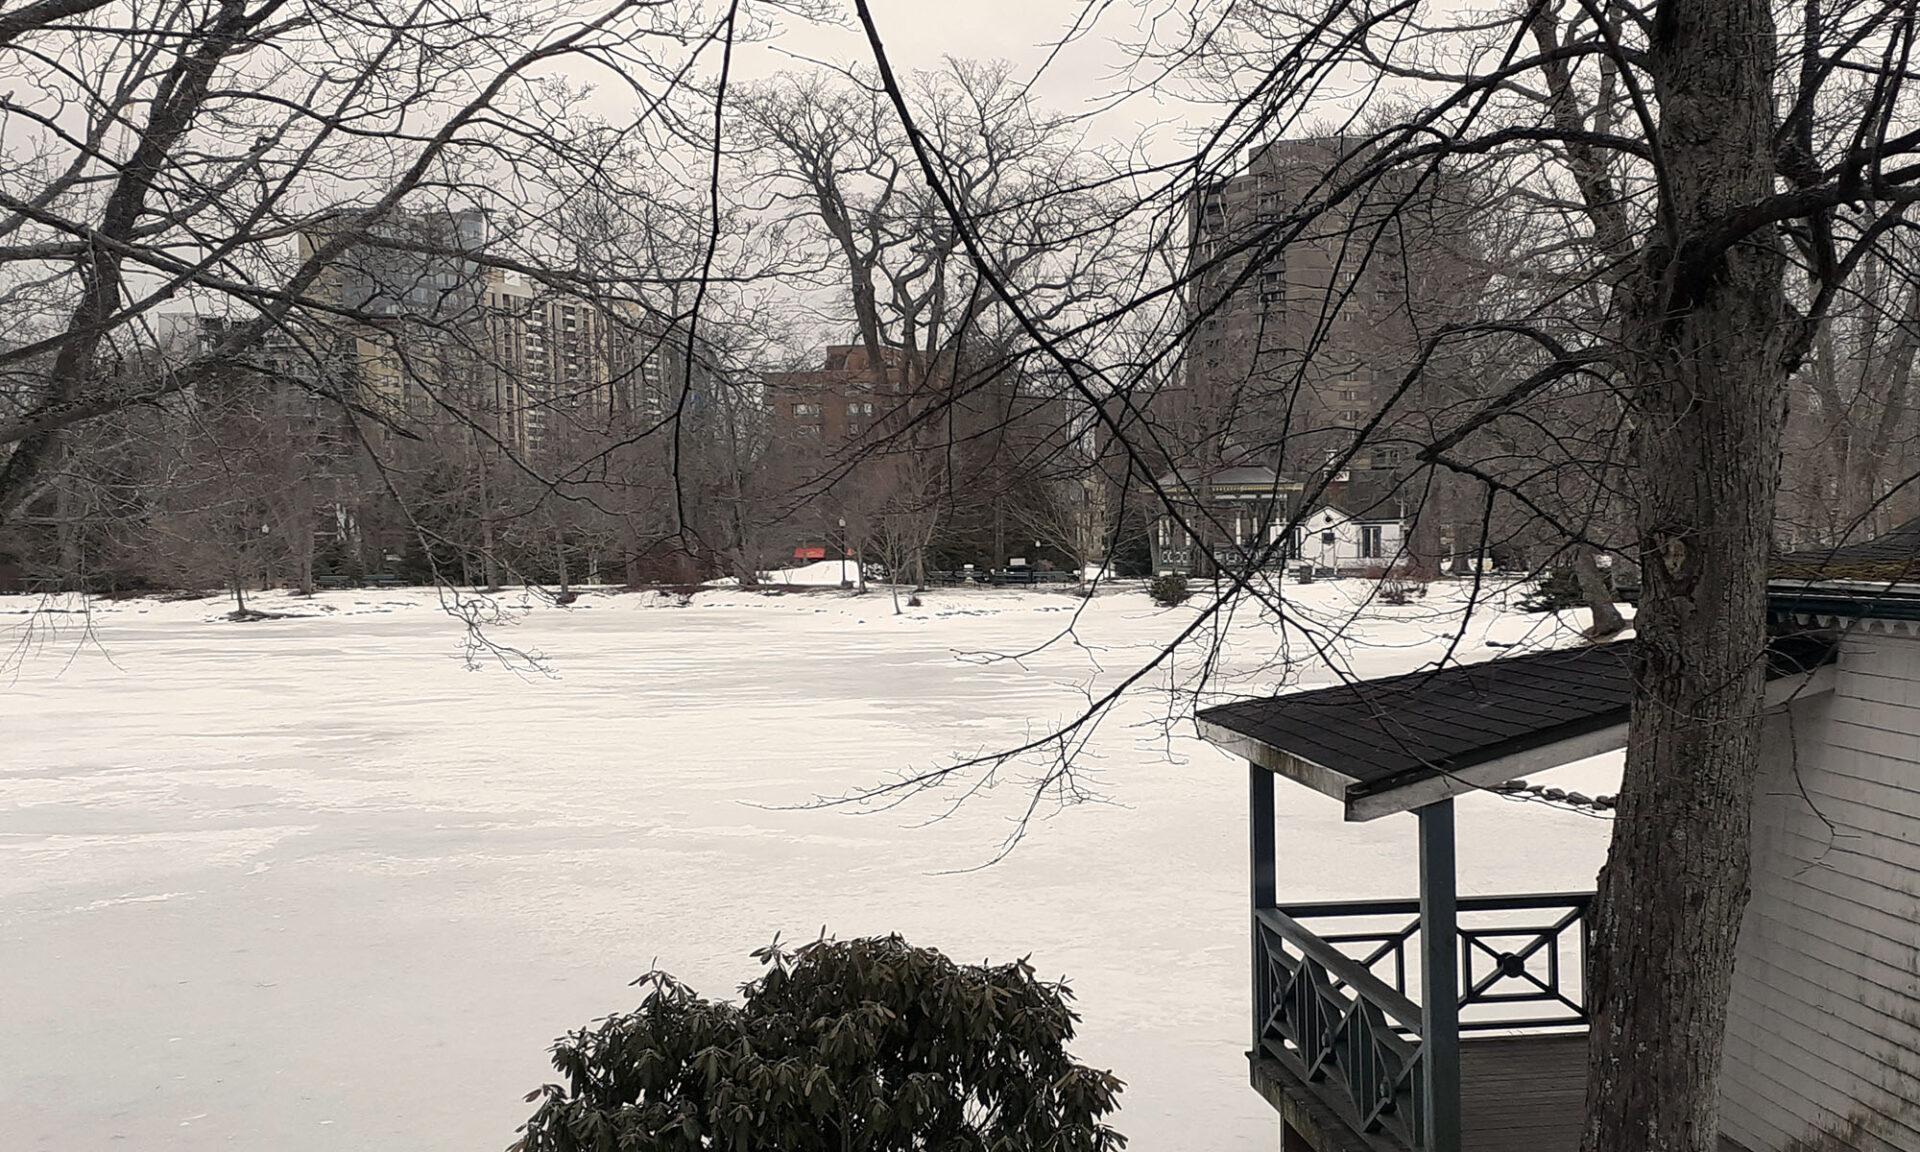 Public Gardens in winter